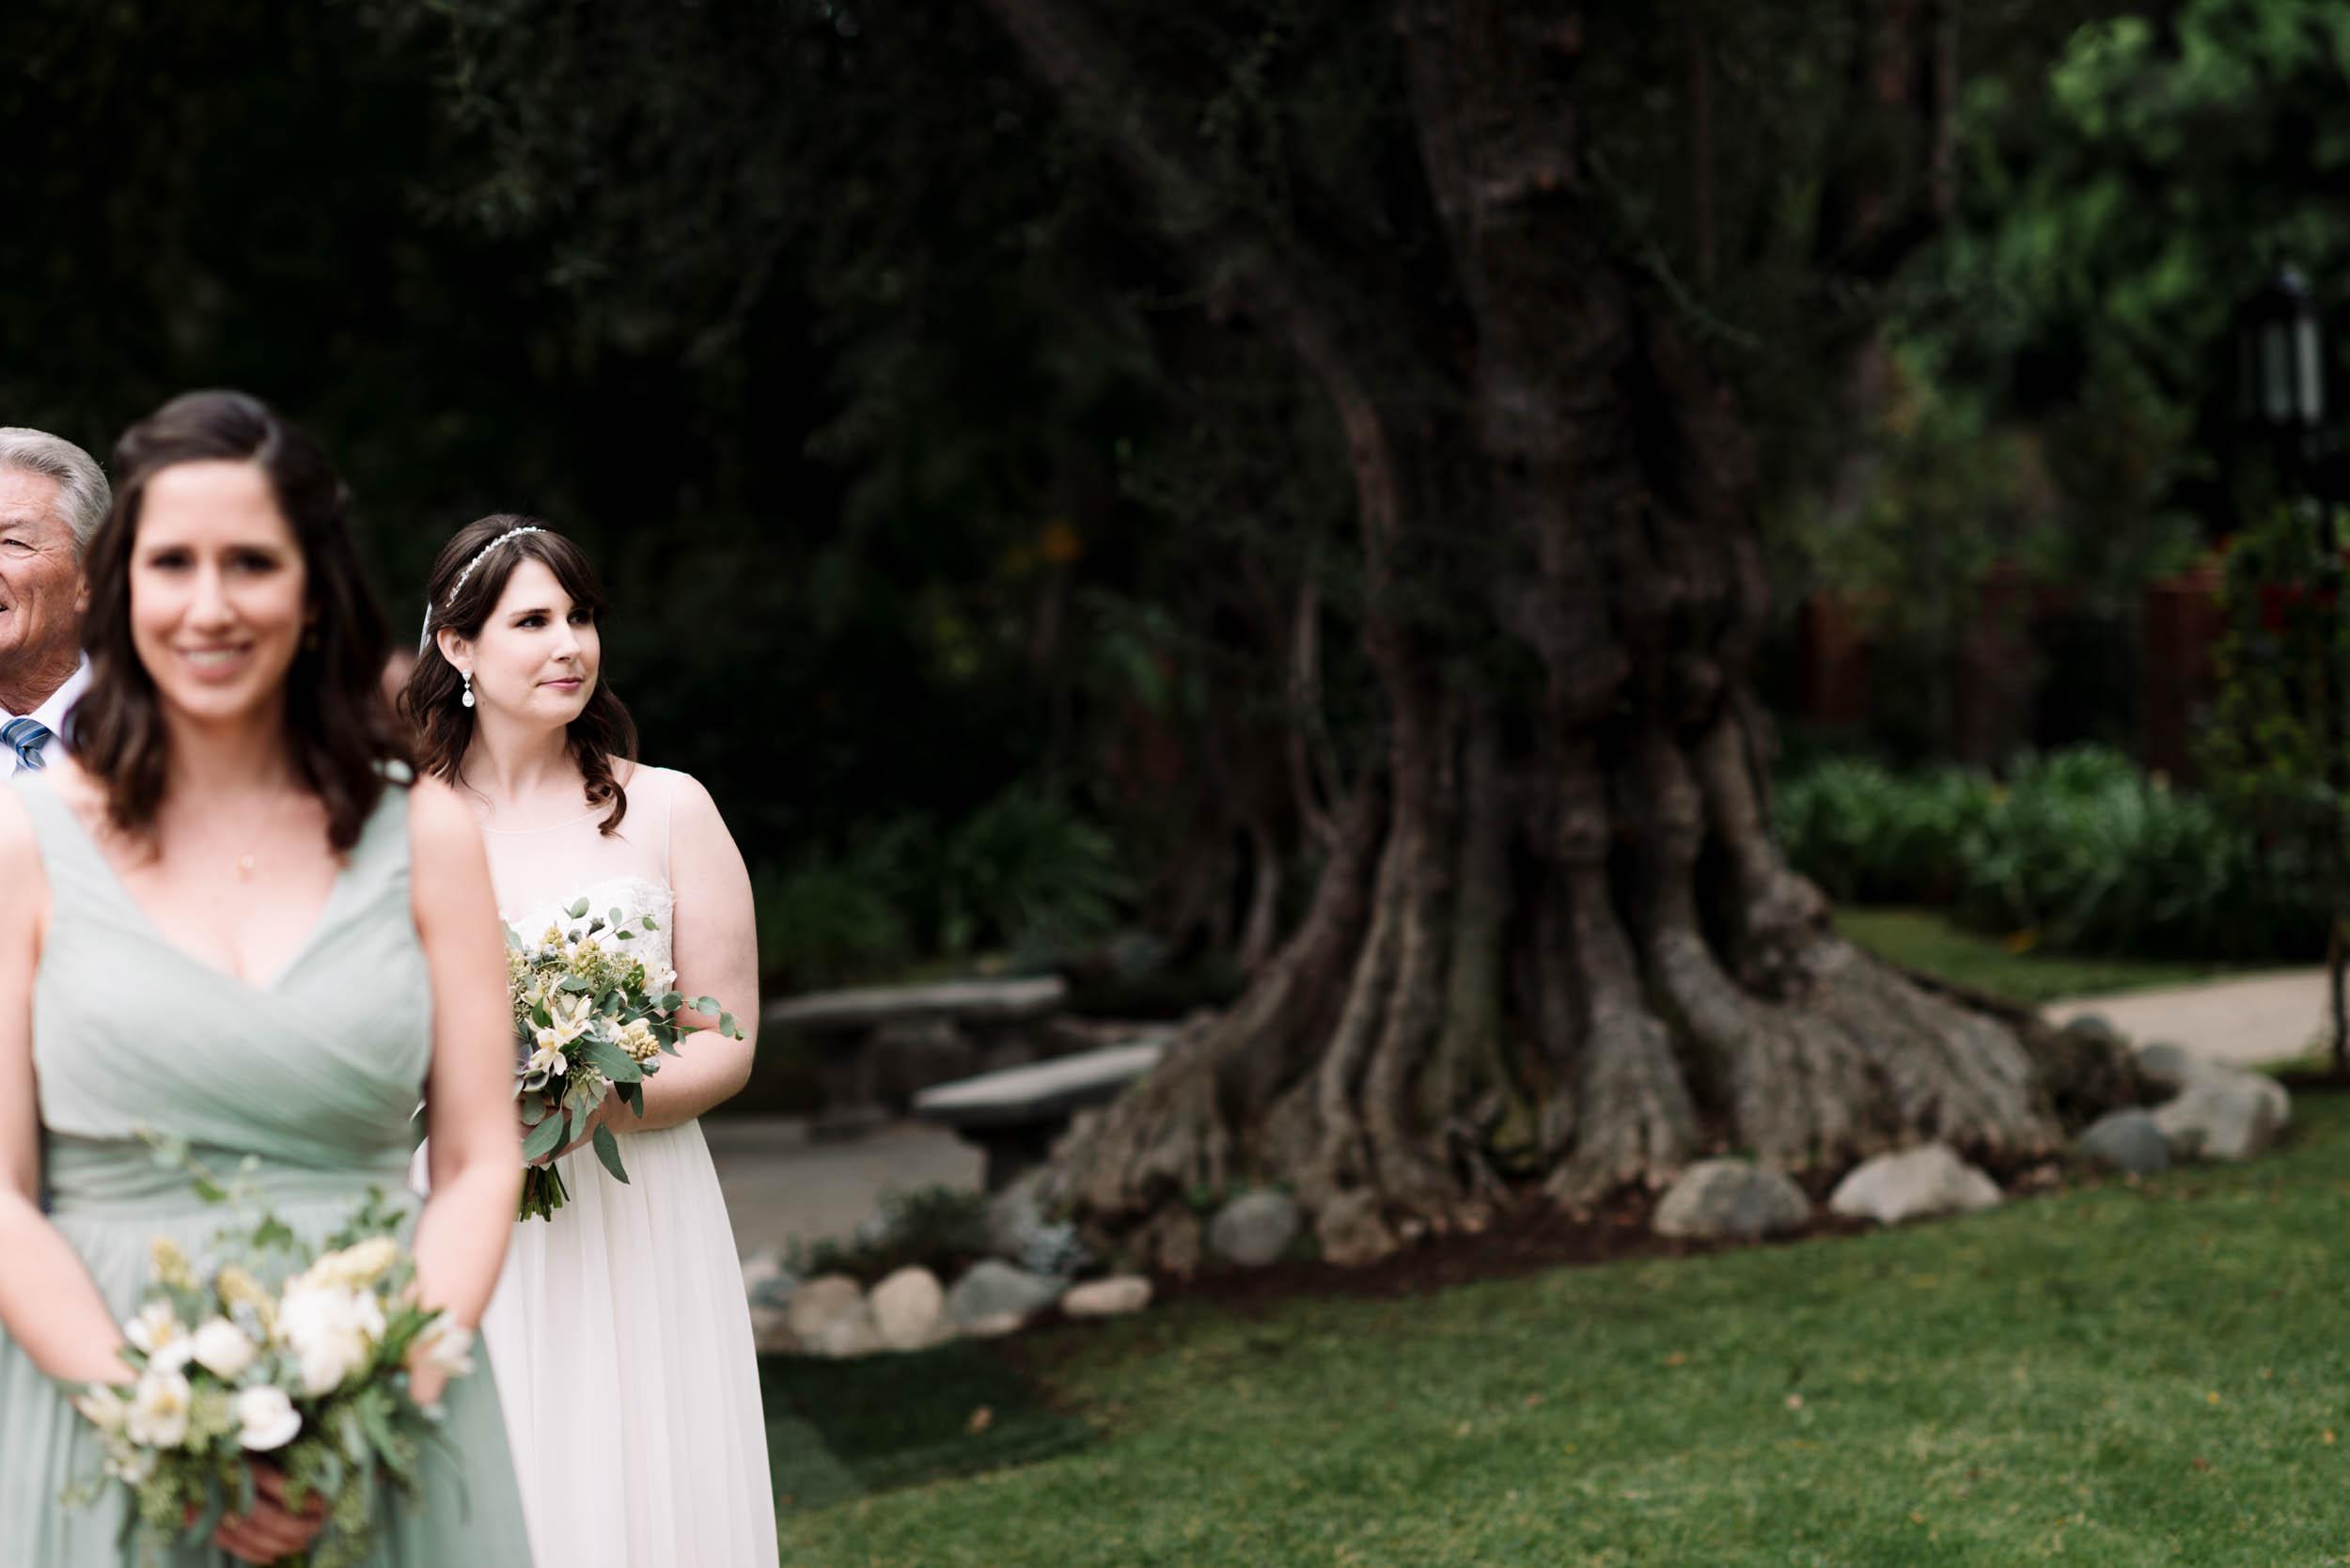 Desination_Wedding_Los Angeles-7.jpg